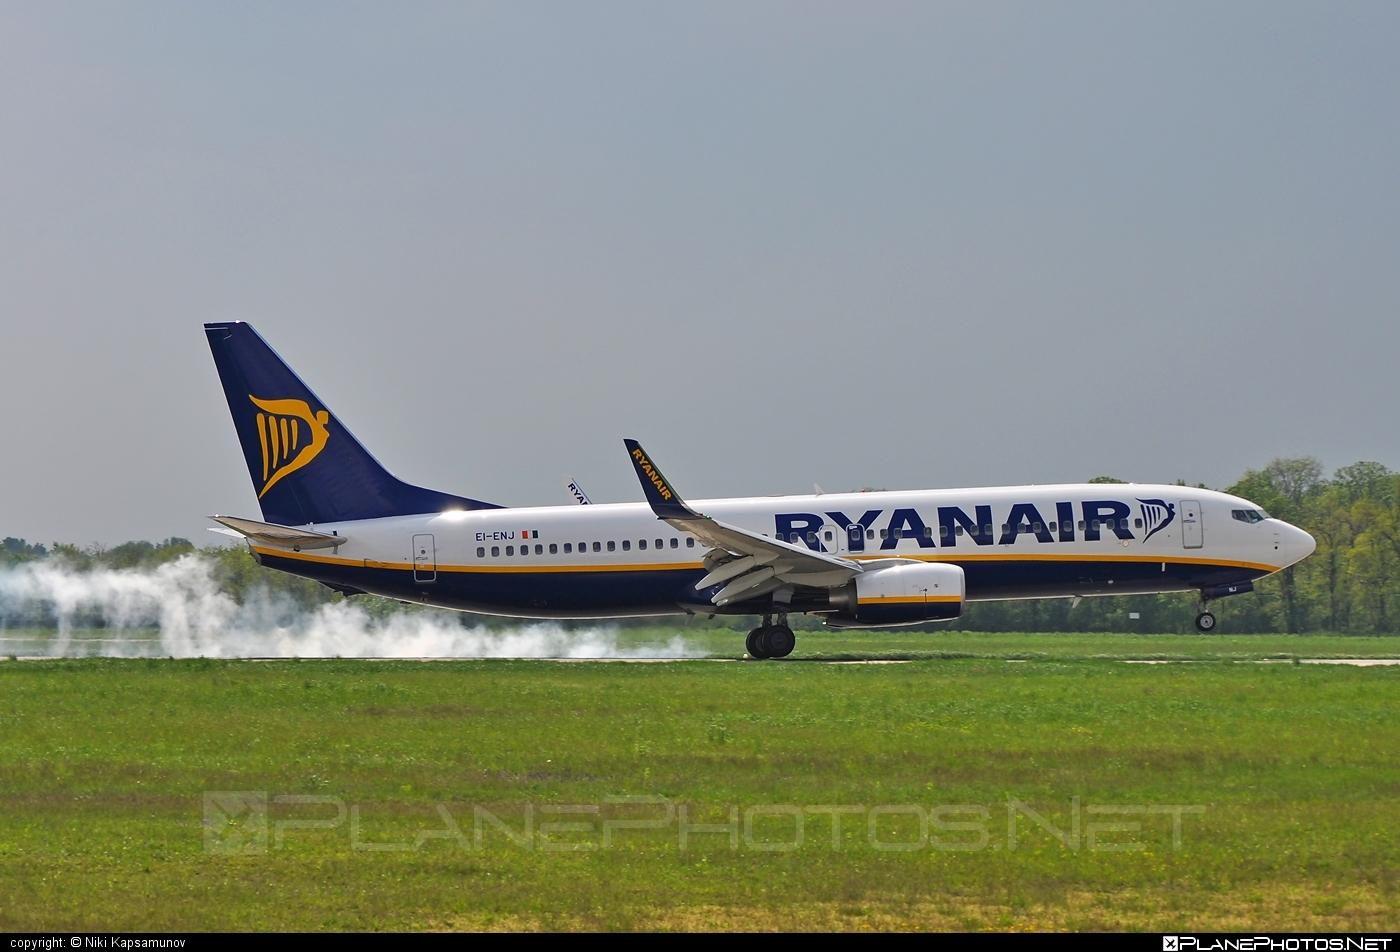 Boeing 737-800 - EI-ENJ operated by Ryanair #b737 #b737nextgen #b737ng #boeing #boeing737 #ryanair